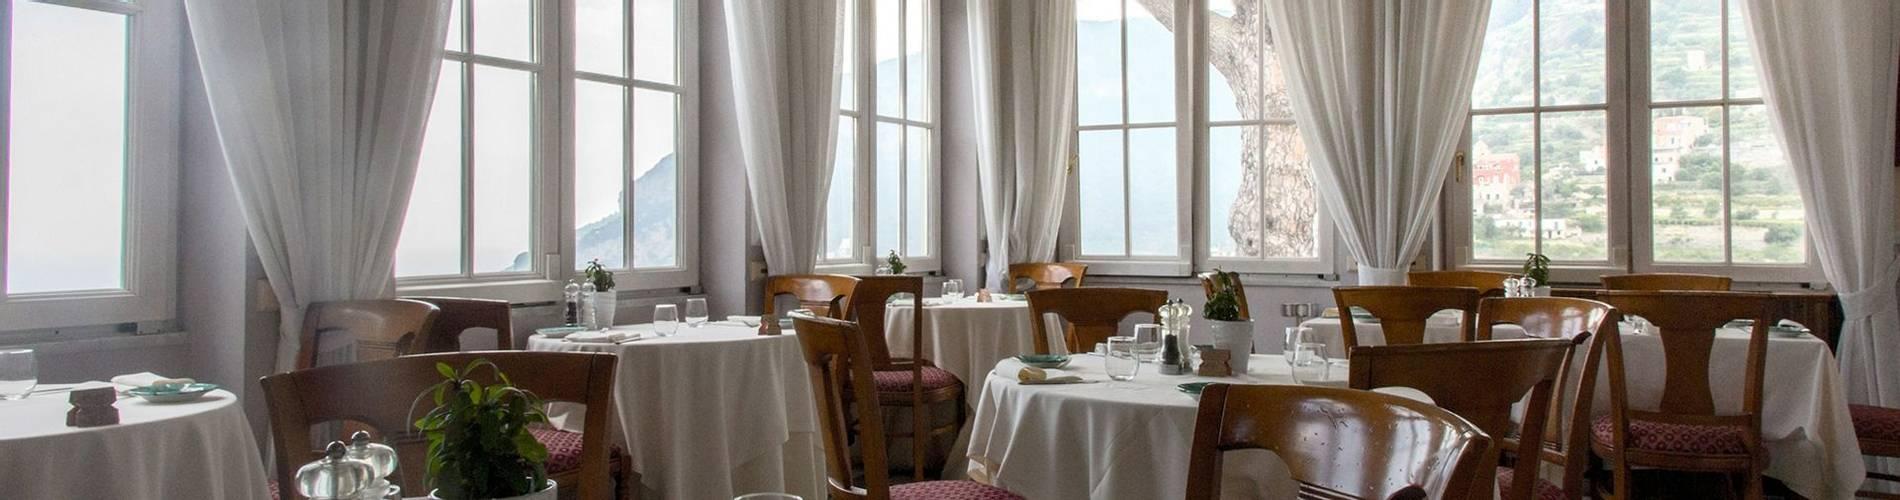 Villa Maria, Amalfi Coast, Italy, restaurant - veranda.jpg